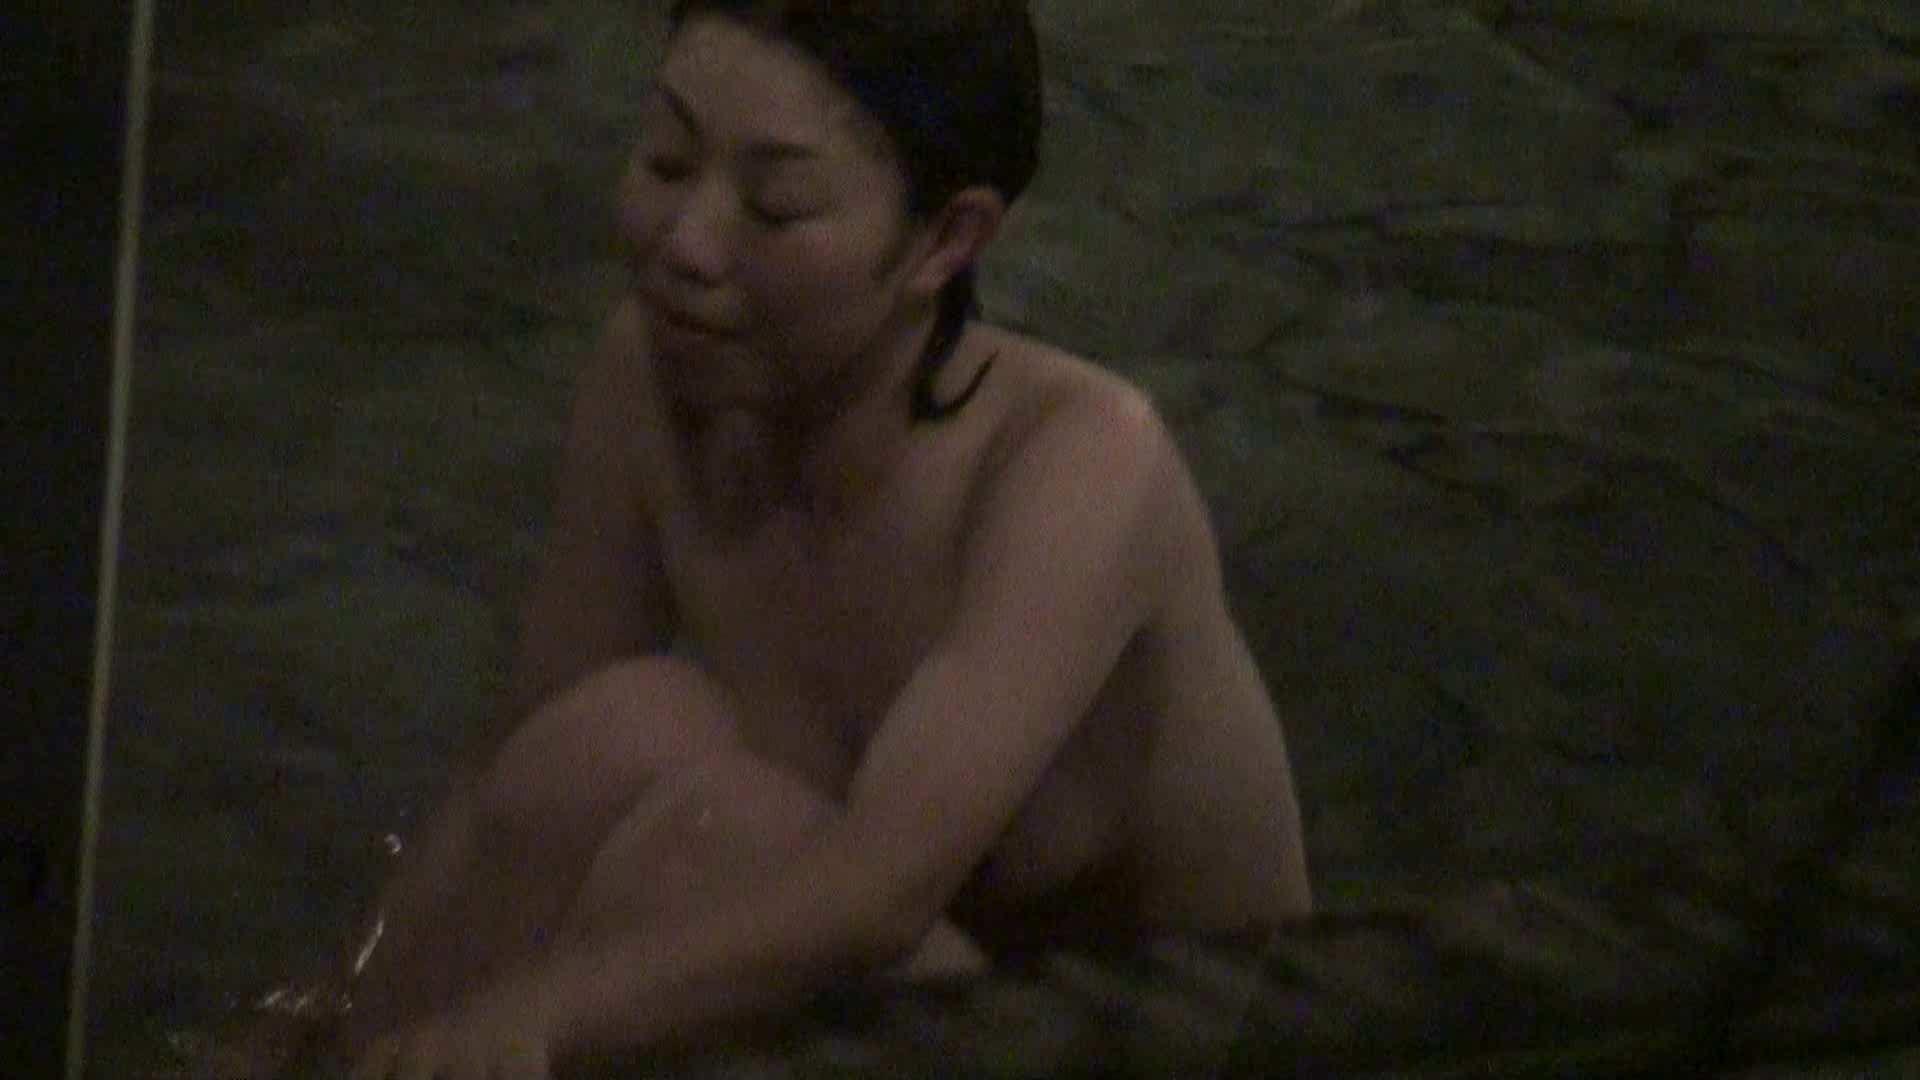 Aquaな露天風呂Vol.330 盗撮   HなOL  83pic 83